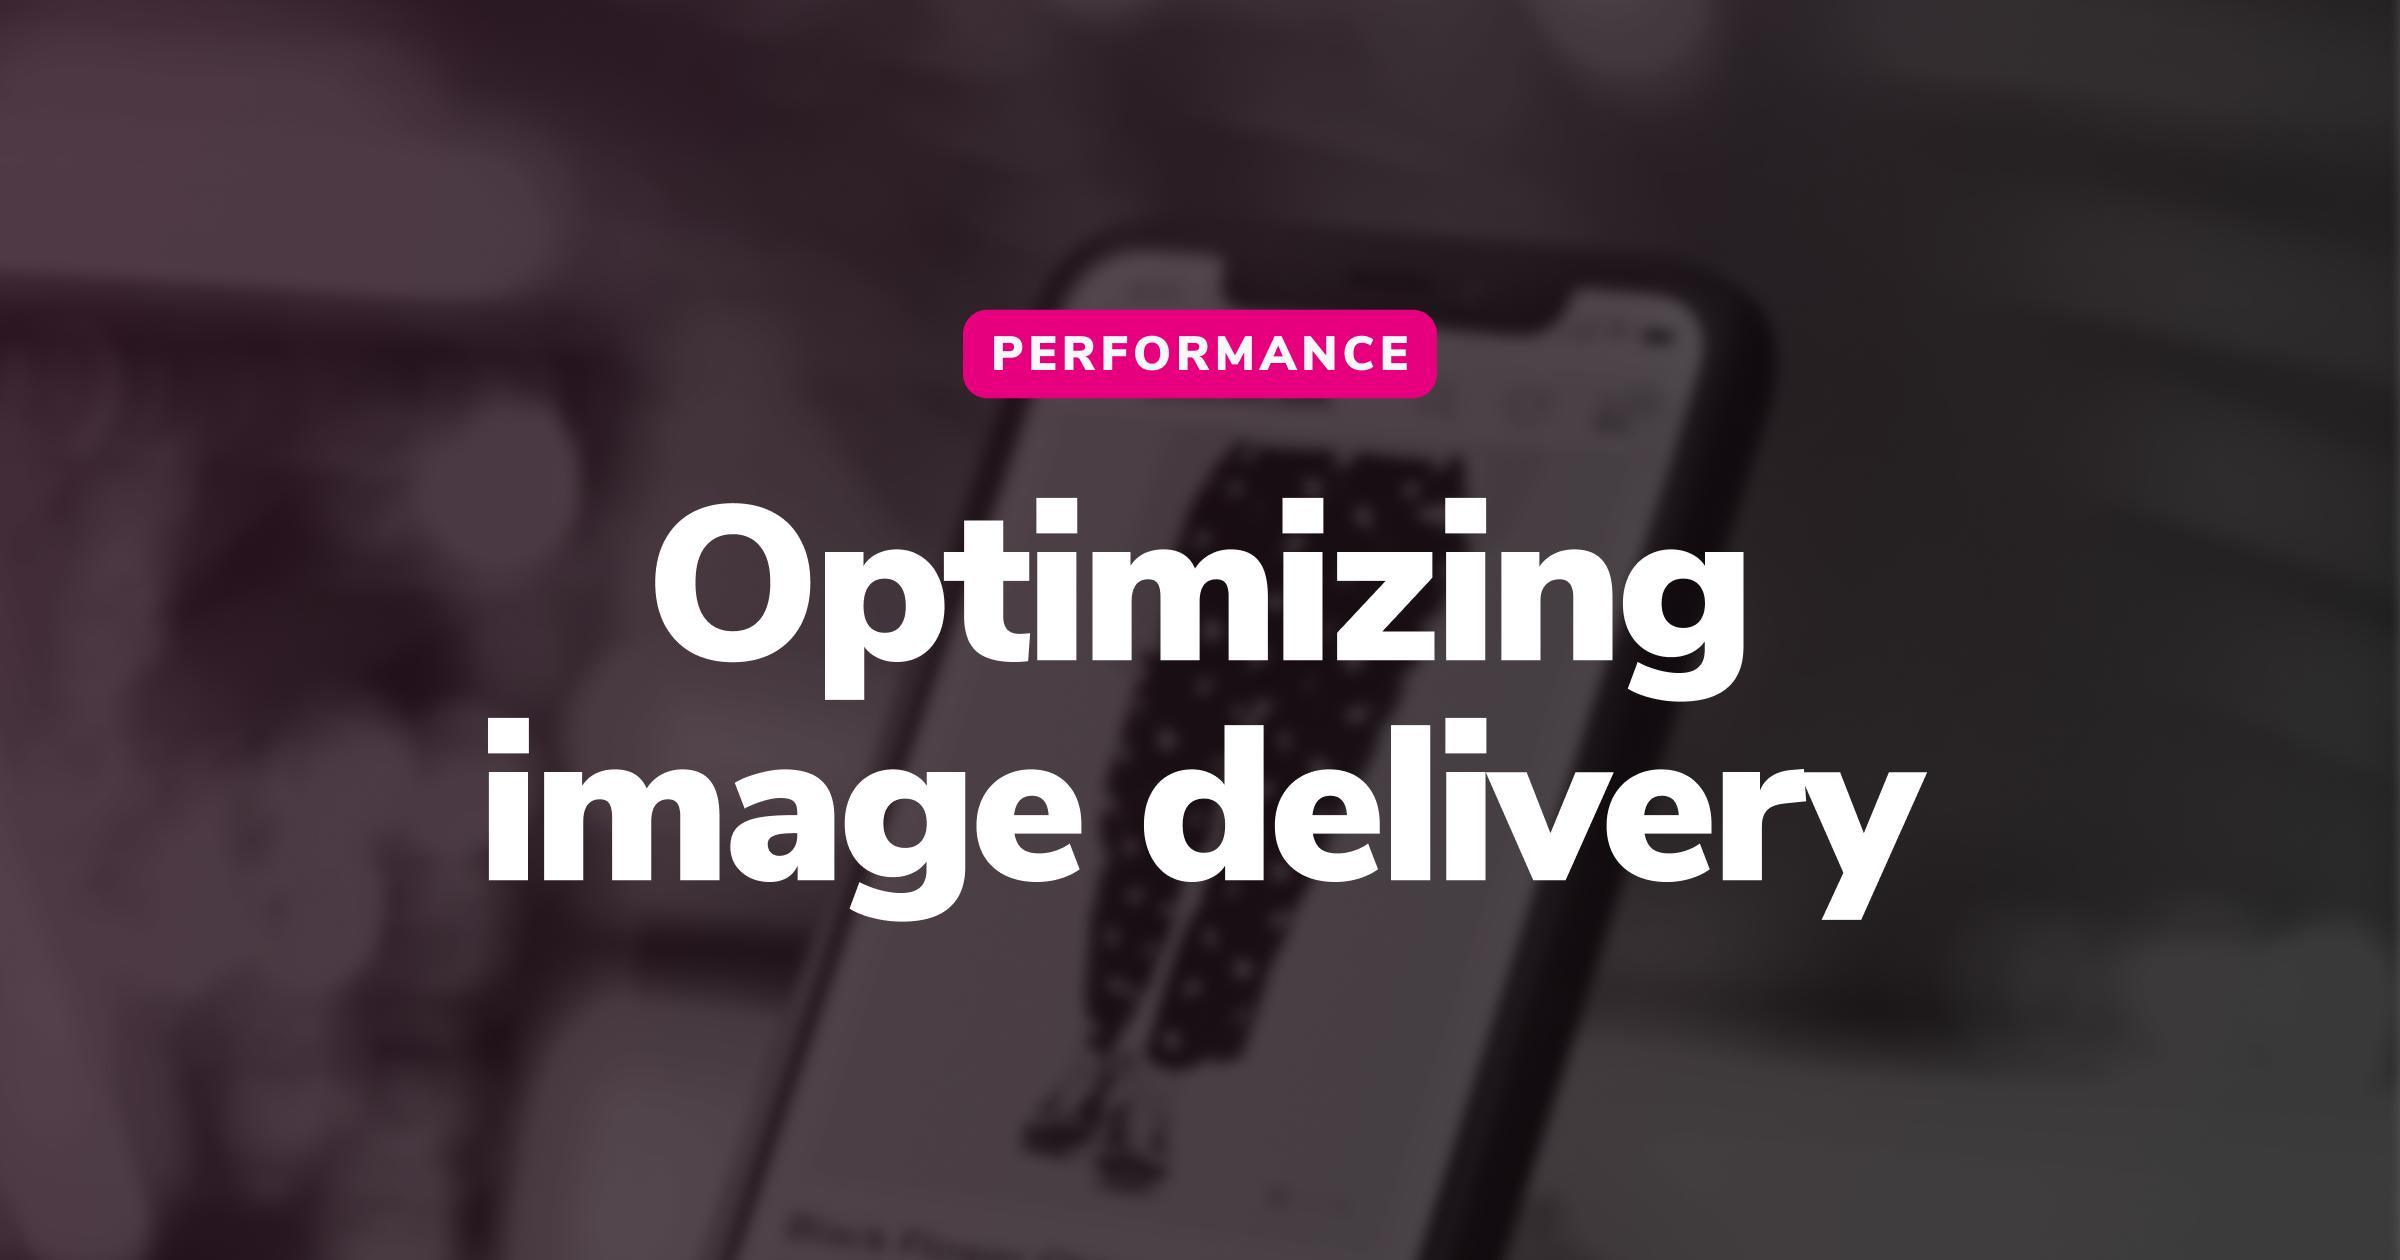 Optimizing image delivery